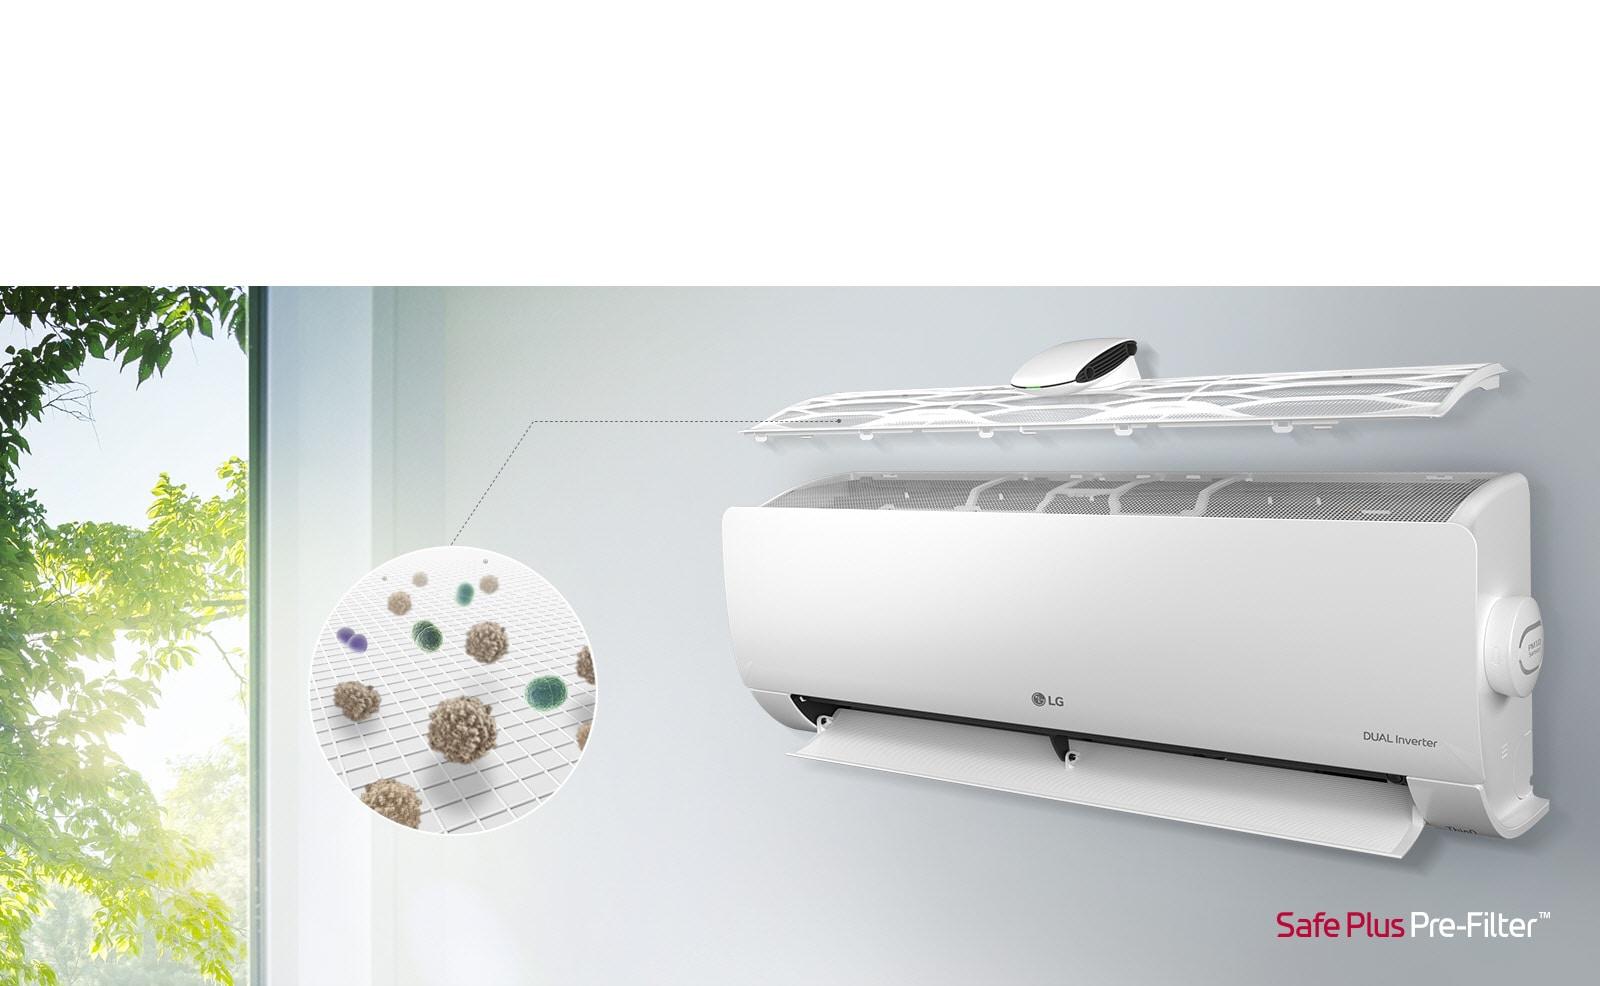 LG 空調安裝在牆上並從側視角可見。頂部面板漂浮上方,可見內部濾網。從預濾網伸出的一條線指向放大圓圈圖,顯示預濾網濾出的灰塵。右下角顯示 SafePlus 預濾網標誌。